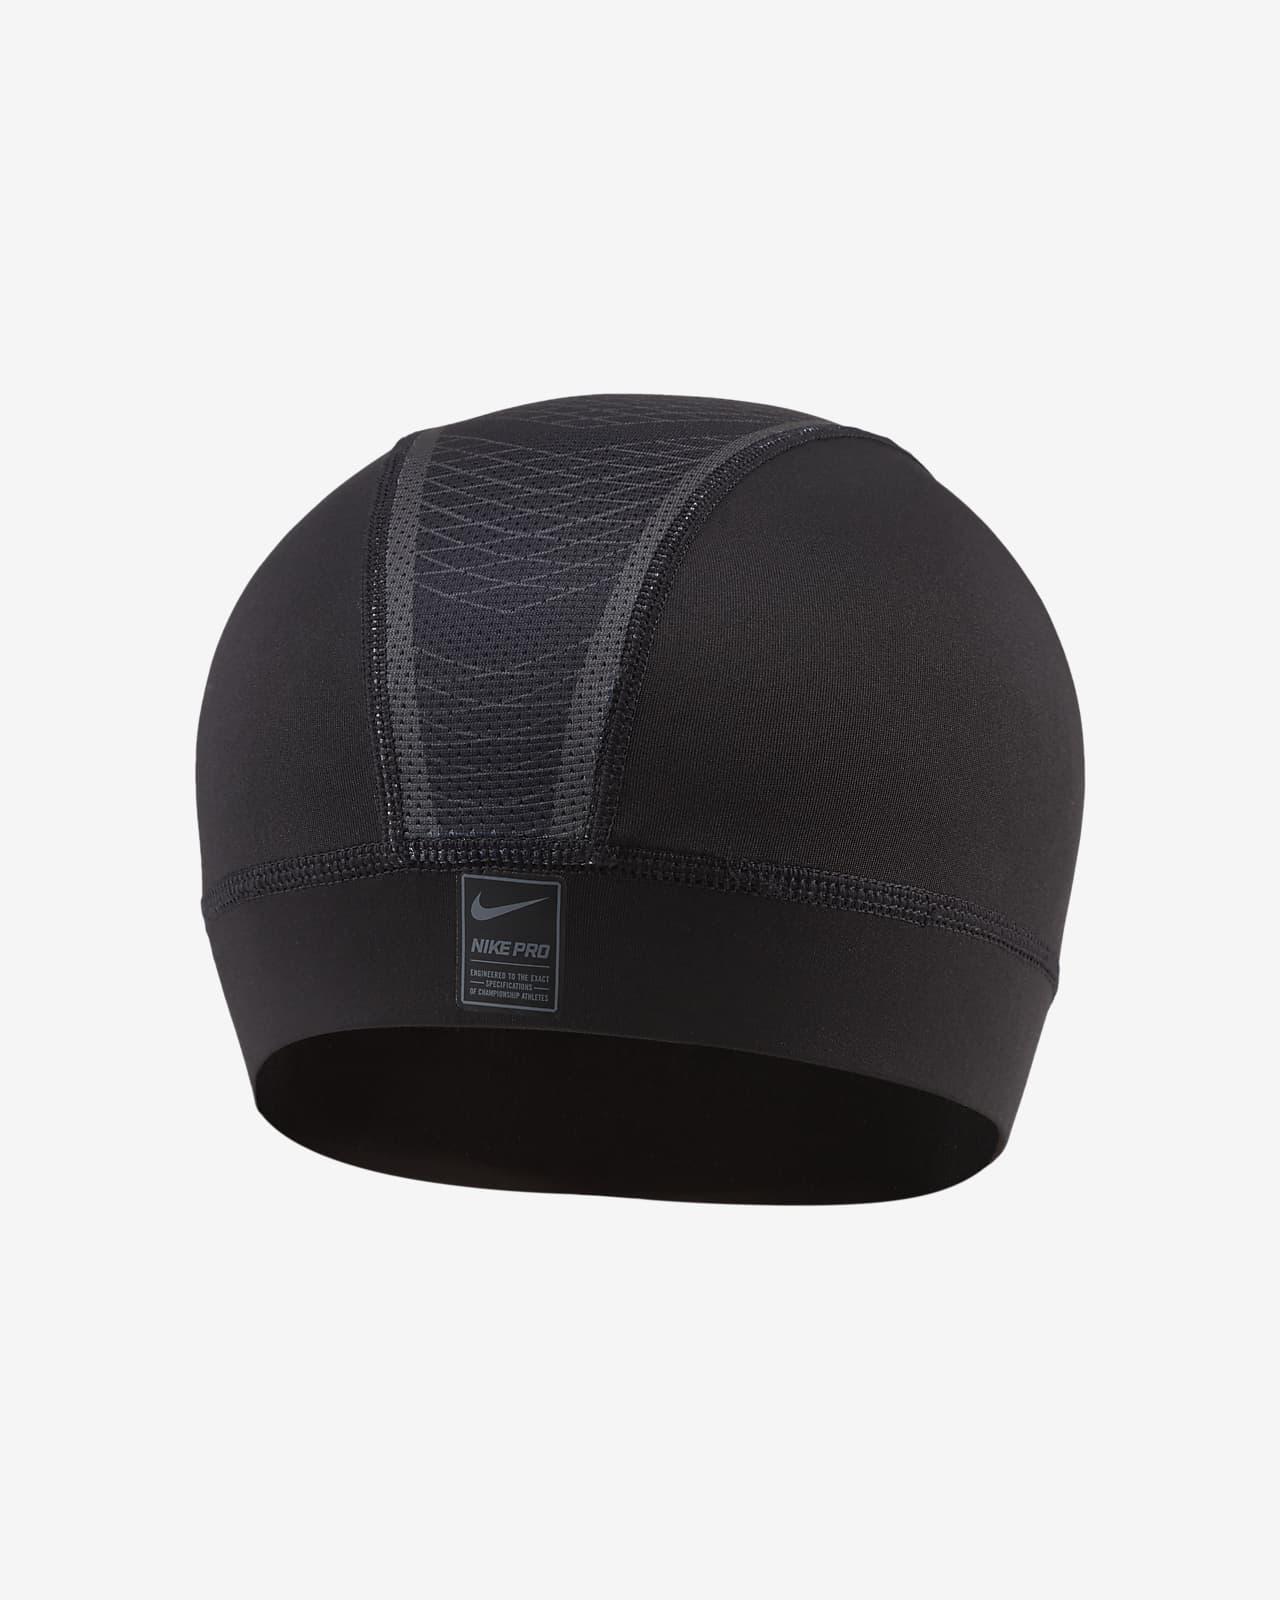 Cubierta para la cabeza Nike Pro Hypercool Vapor 4.0